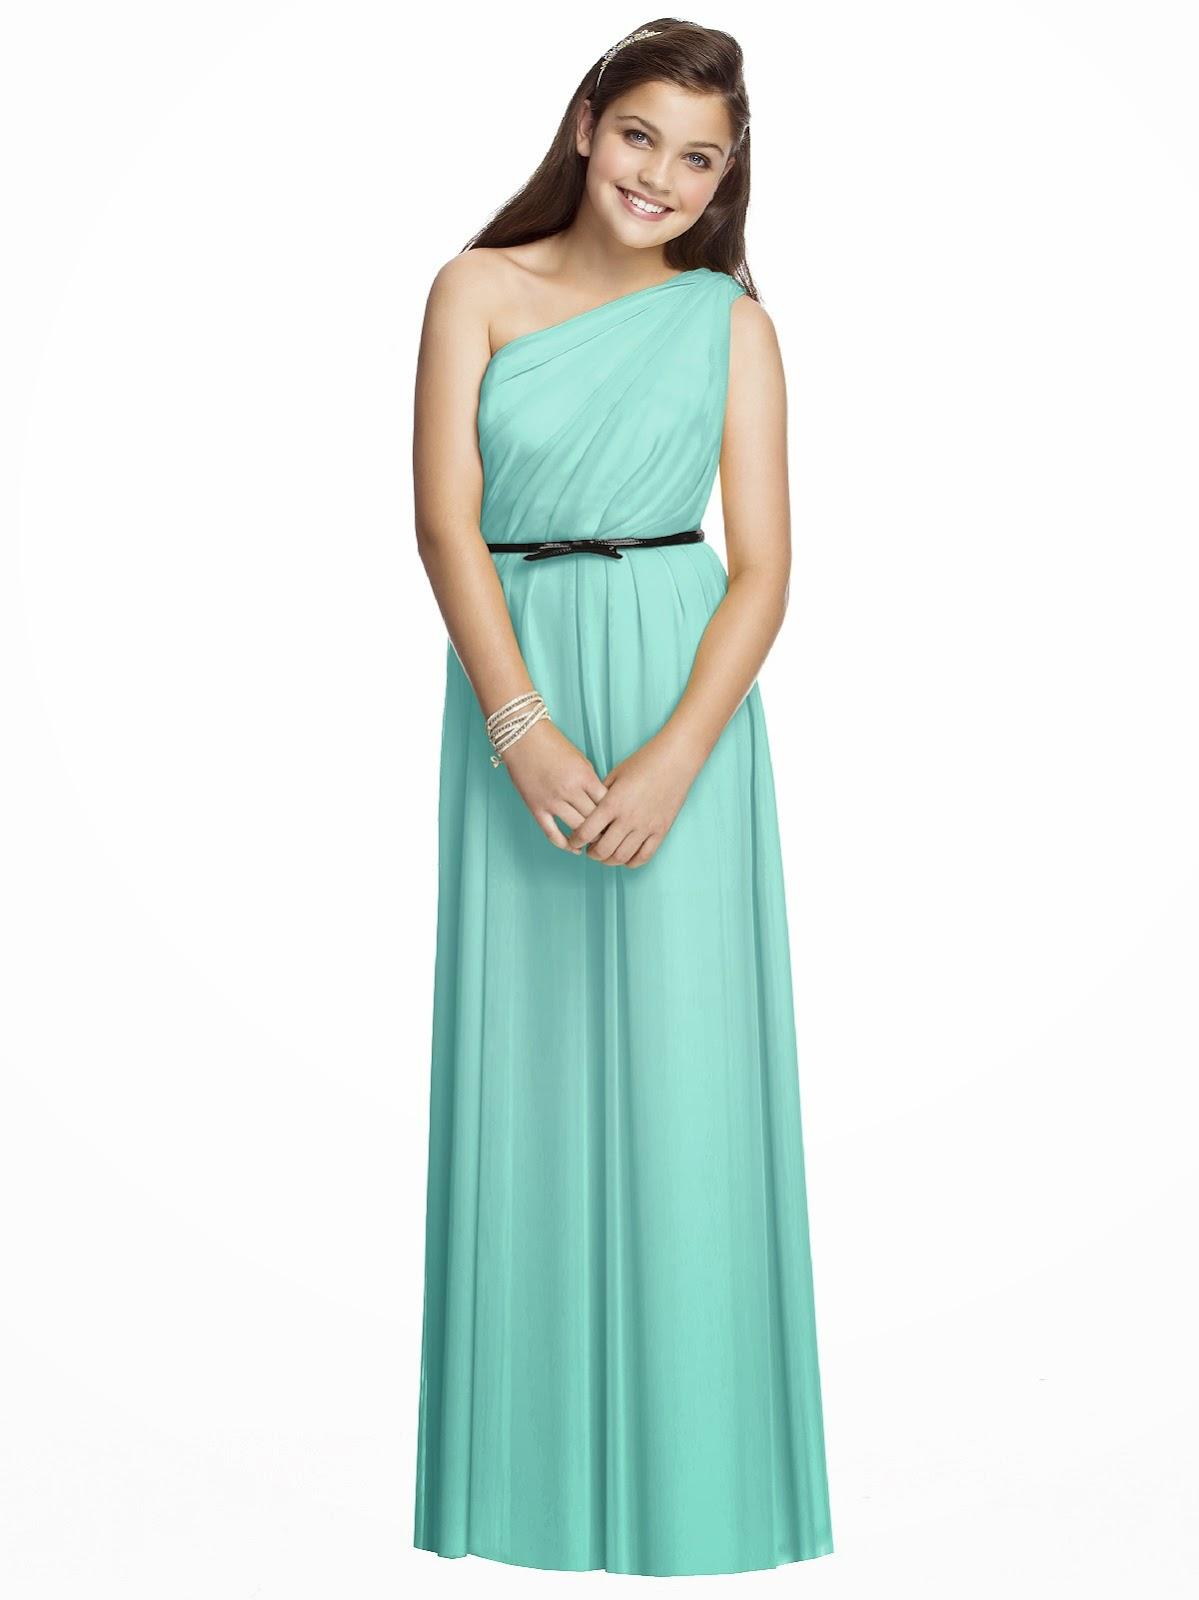 Macy S Simple Wedding Dresses Wedding Dresses